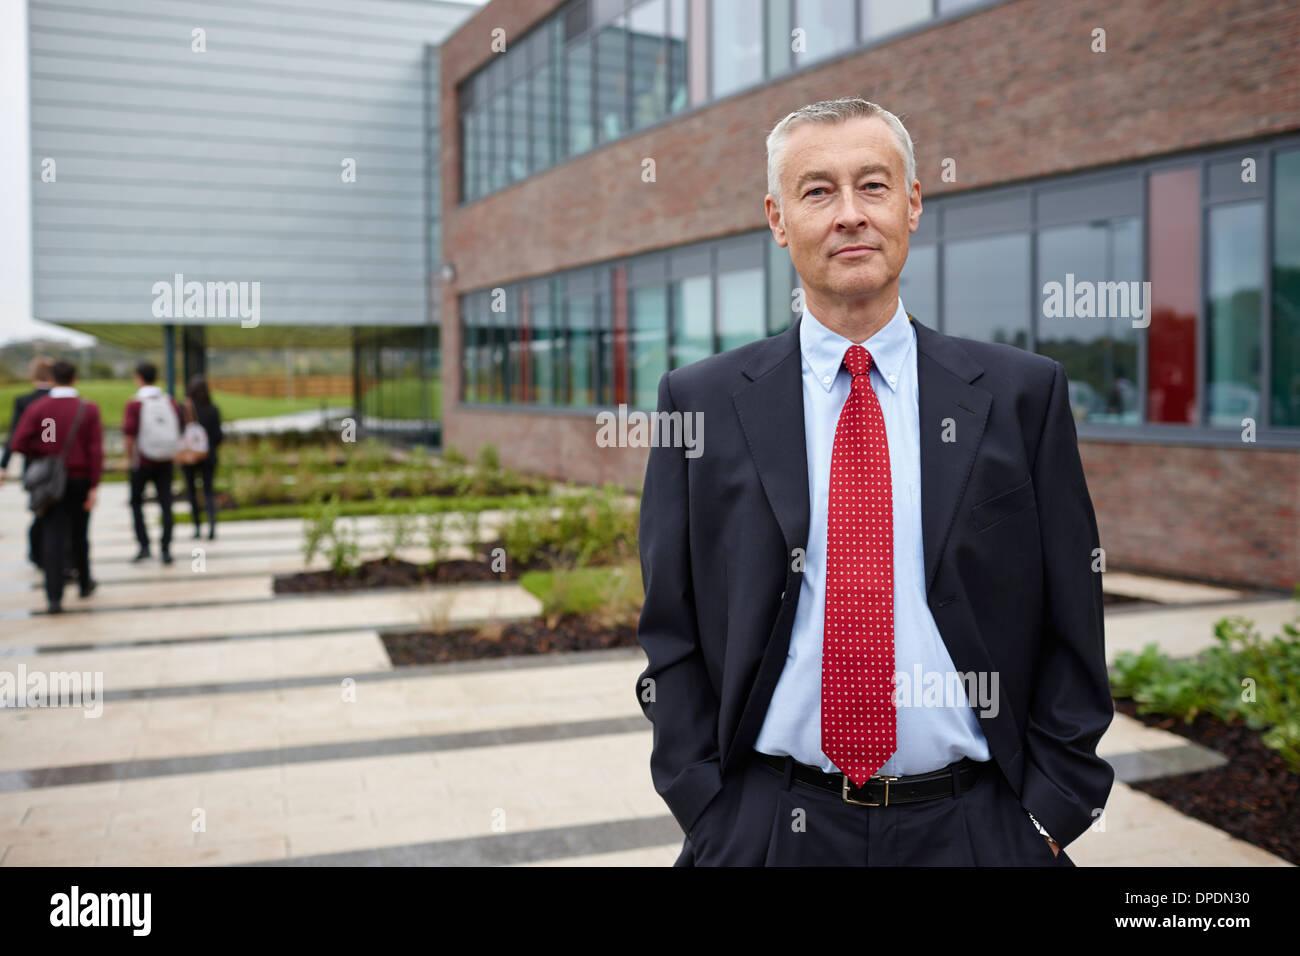 Portrait of mature male teacher outside school - Stock Image